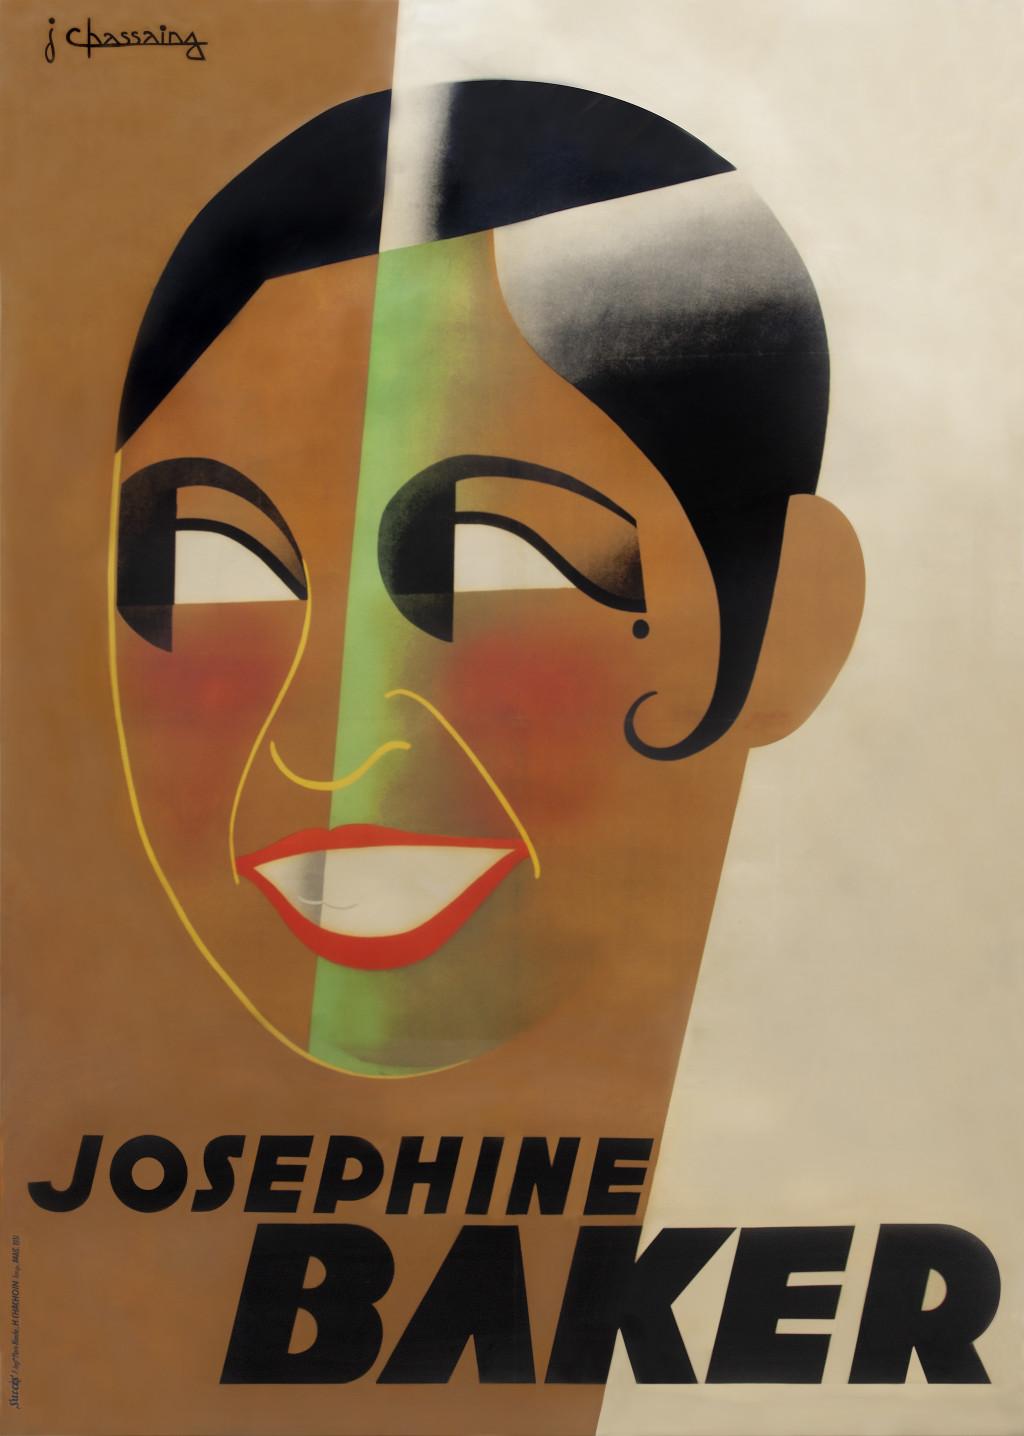 Jean Chassaing, Josephine Baker, 1931.